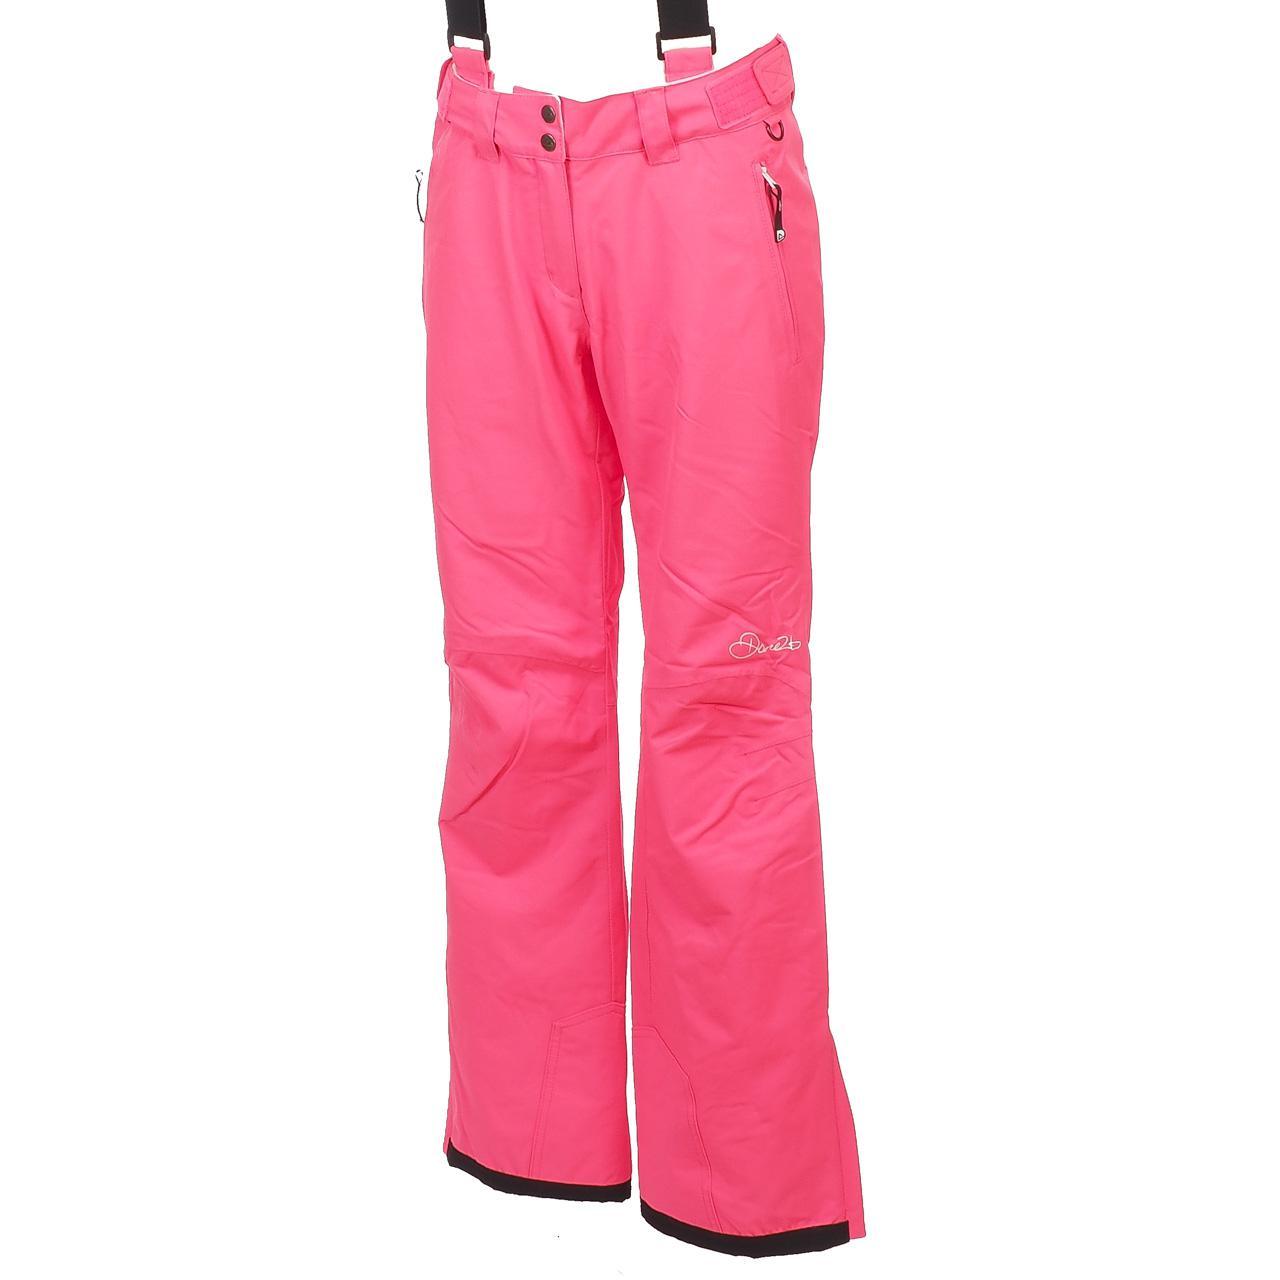 Ski-Pants-Surf-Dare-2b-Stand-for-II-Rsepantski-L-Pink-16116-New